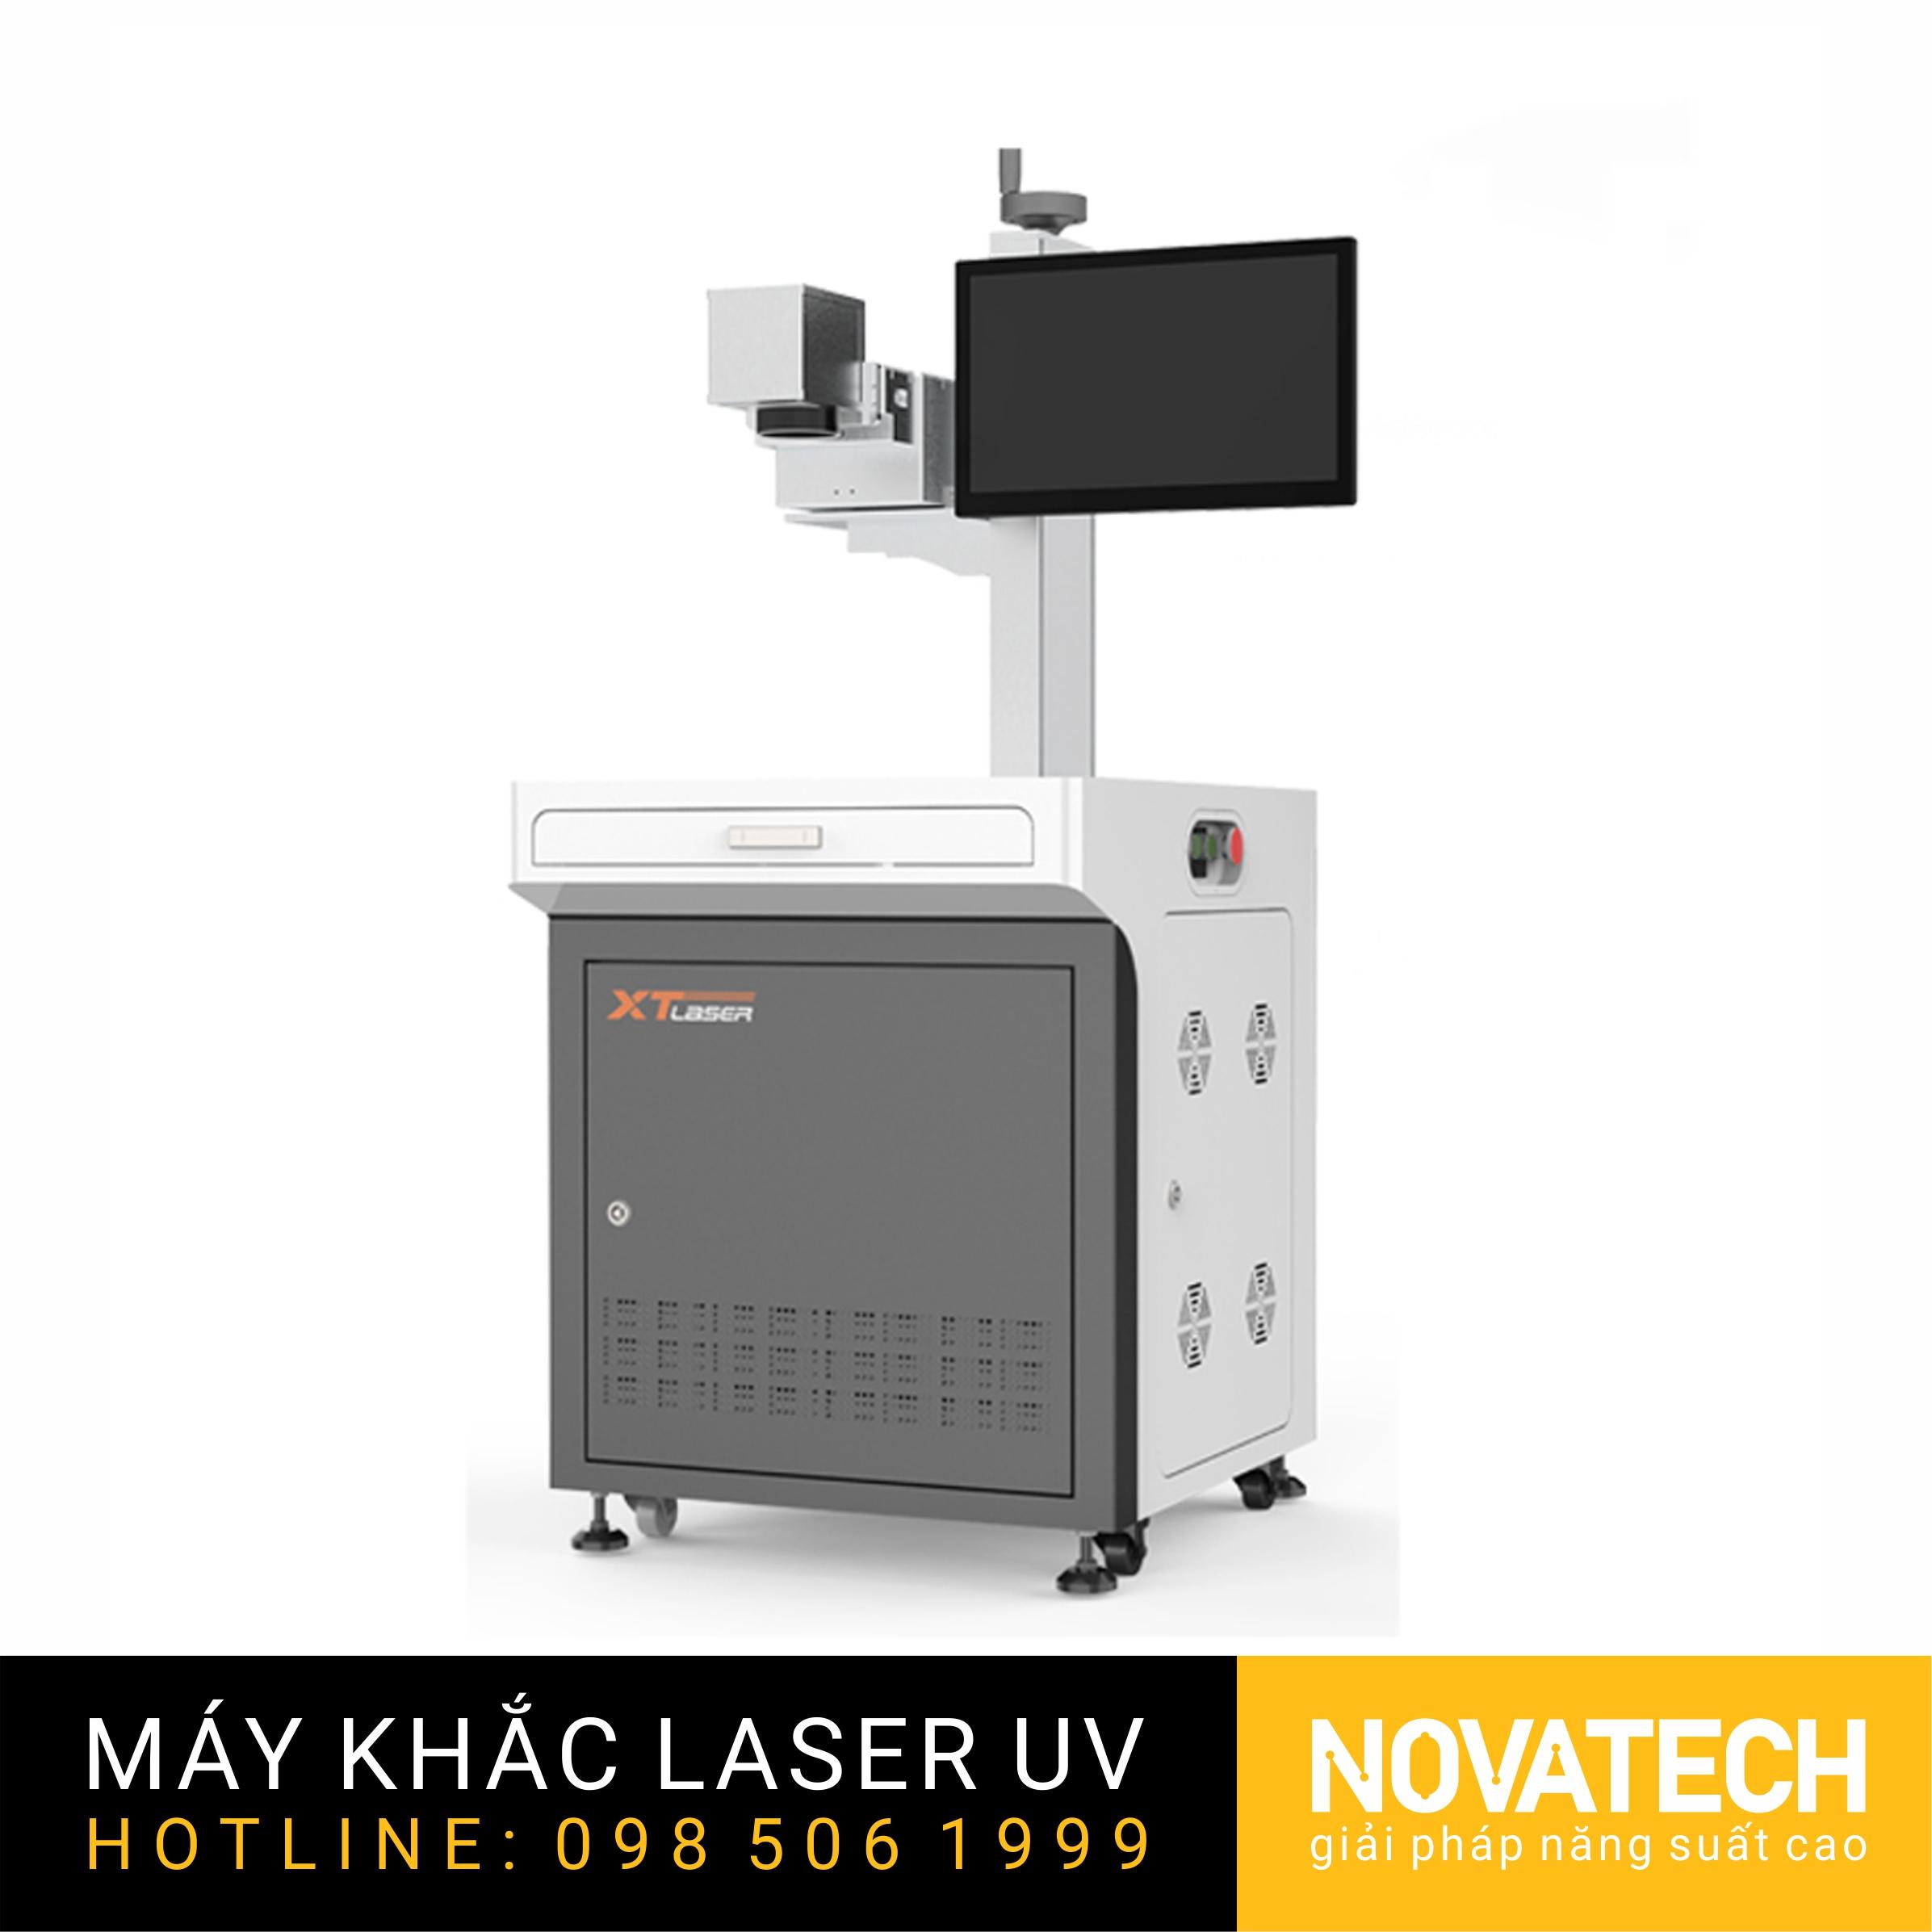 Máy khắc LASER UV 3W kiểu desktop